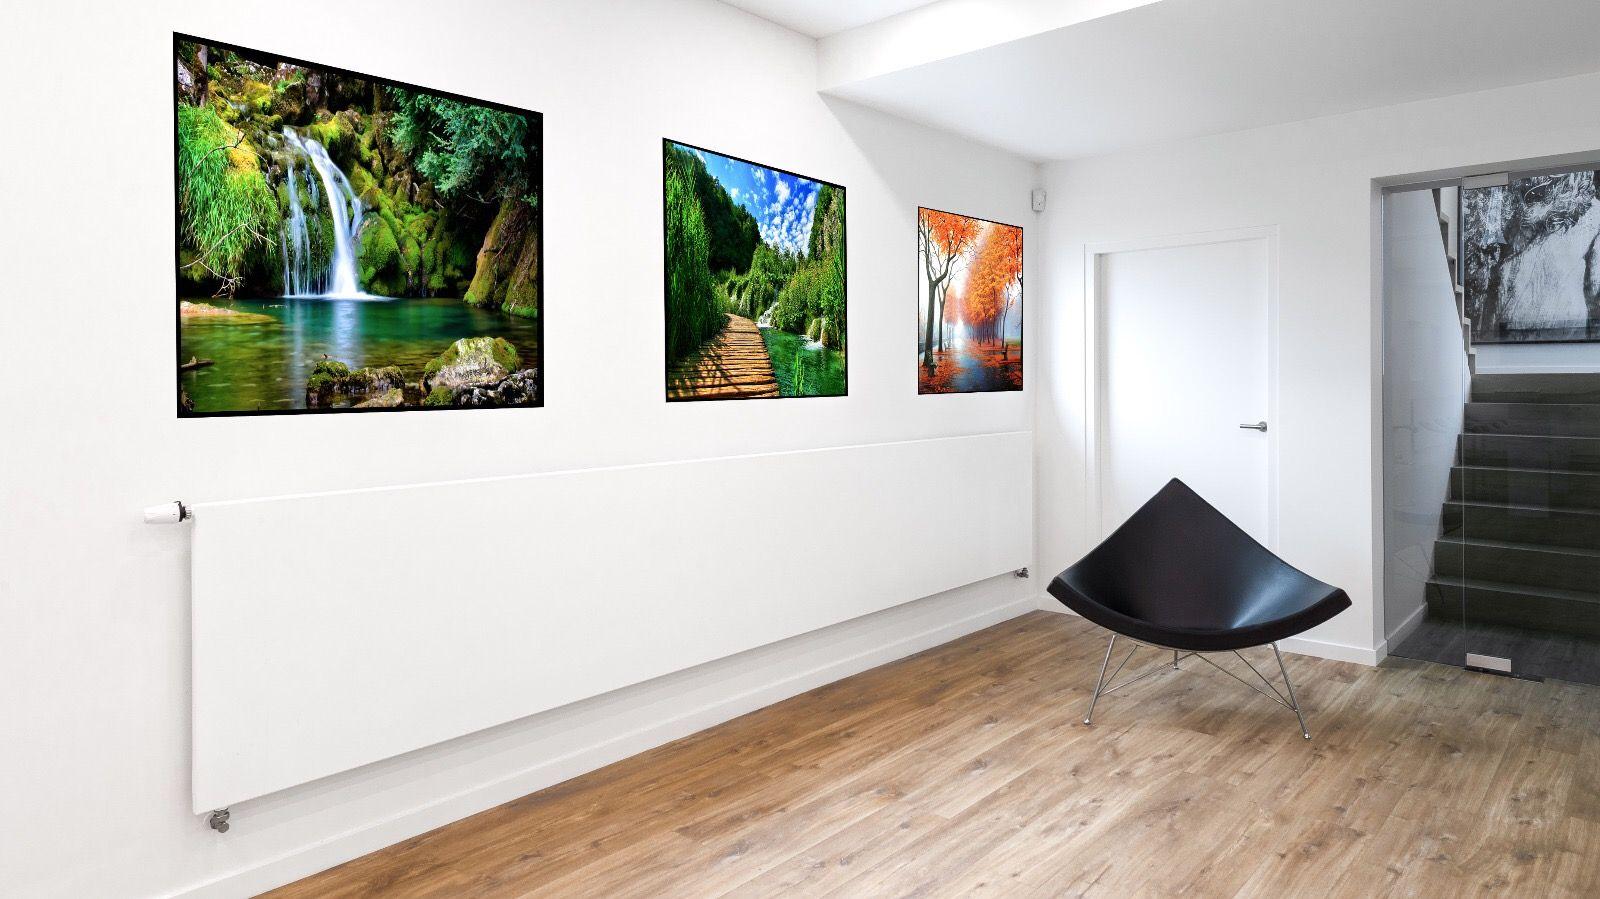 Studio Dijkgraaf interieurfotograaf Rotterdam